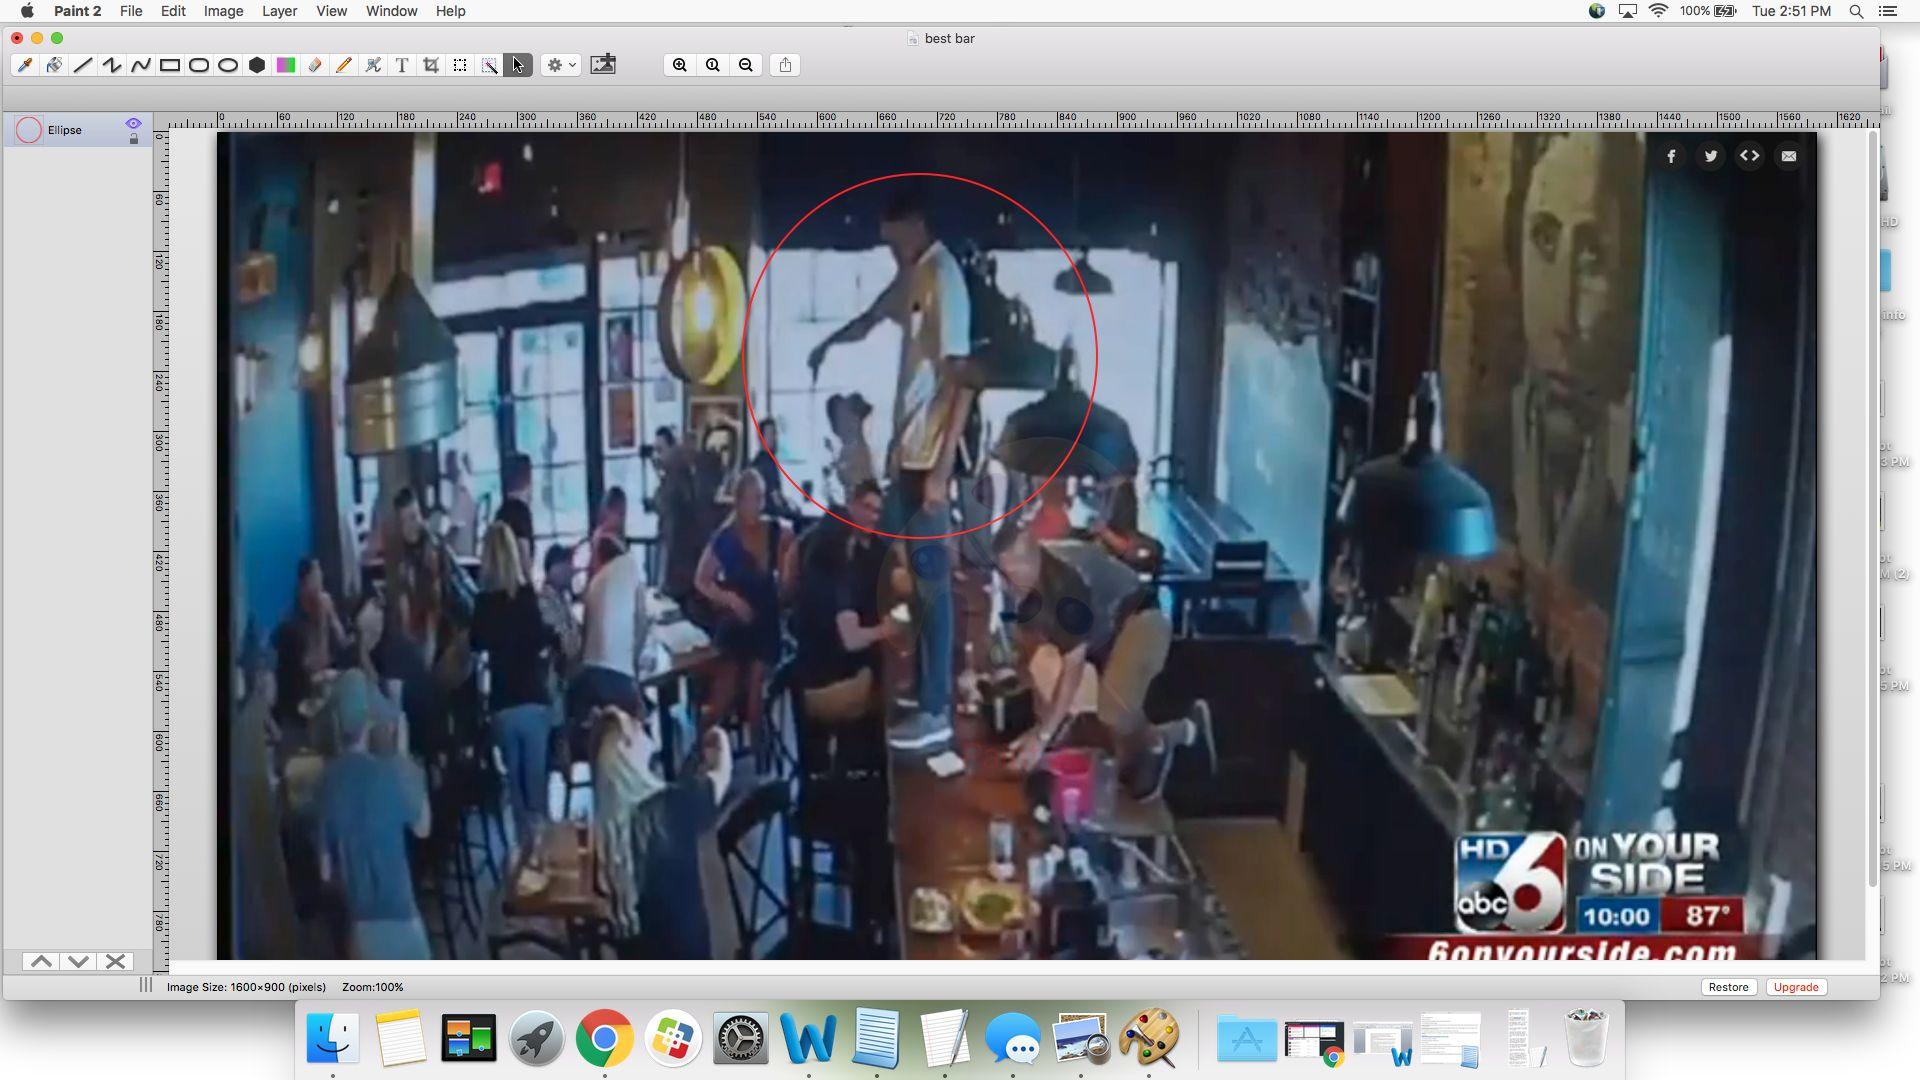 drunk man in bar incites panic